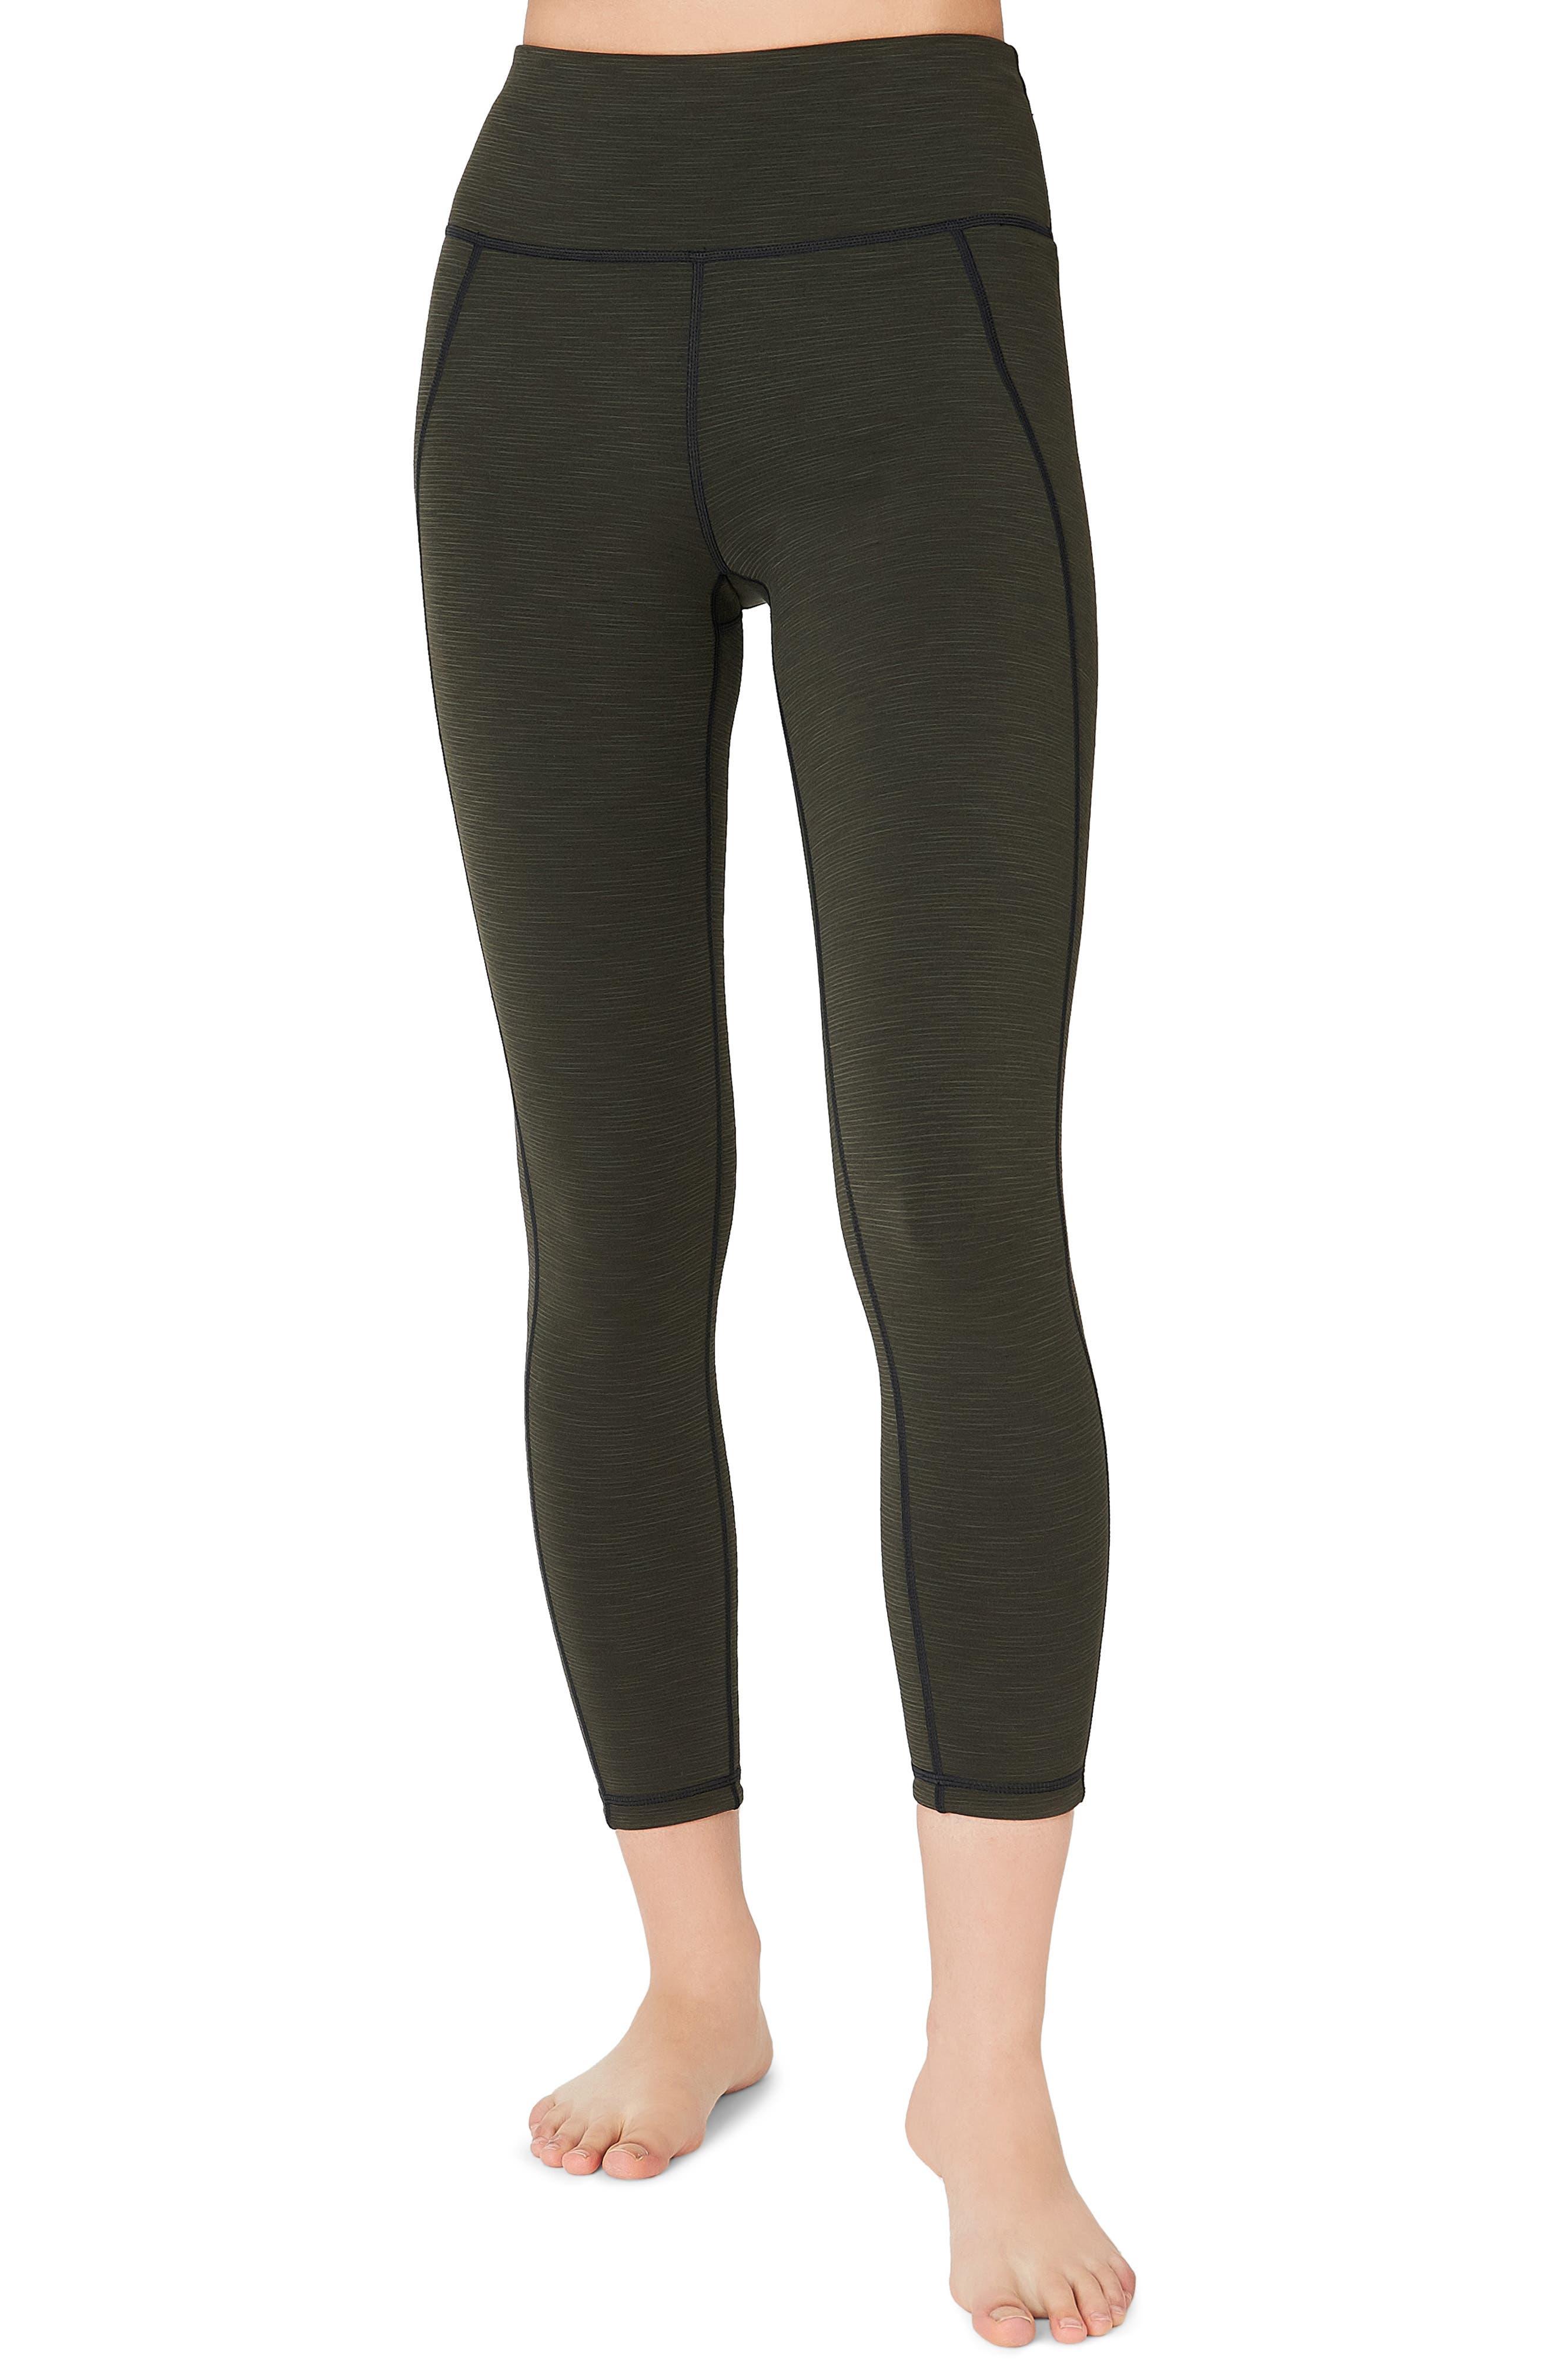 SWEATY BETTY Reversible Yoga Leggings, Main, color, 300